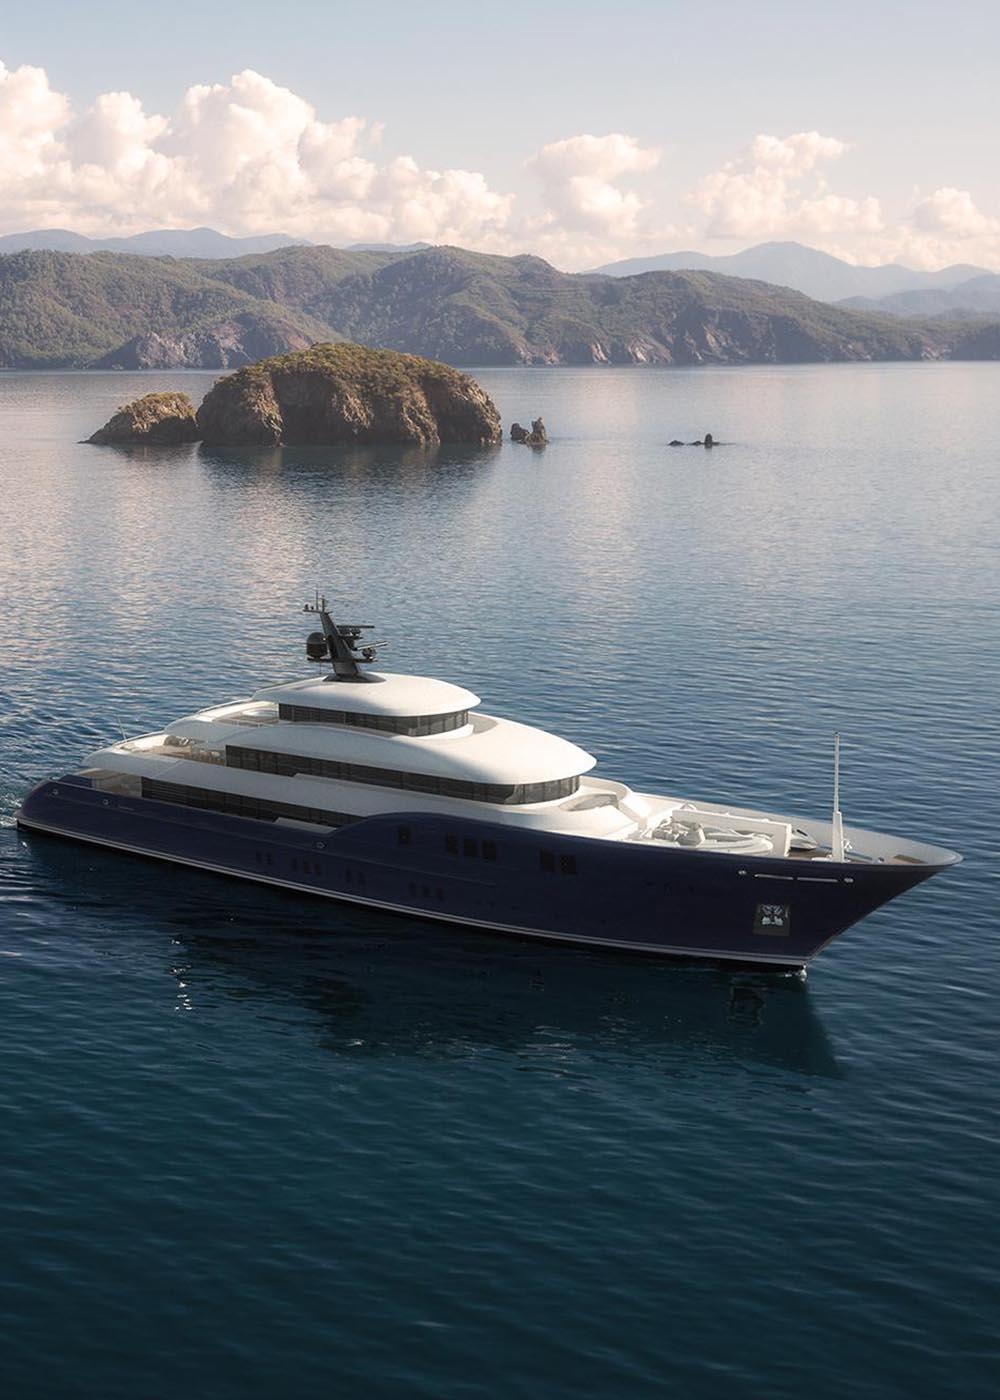 Diana-Yacht-Design-apresenta-conceito-de-55m-boatshopping